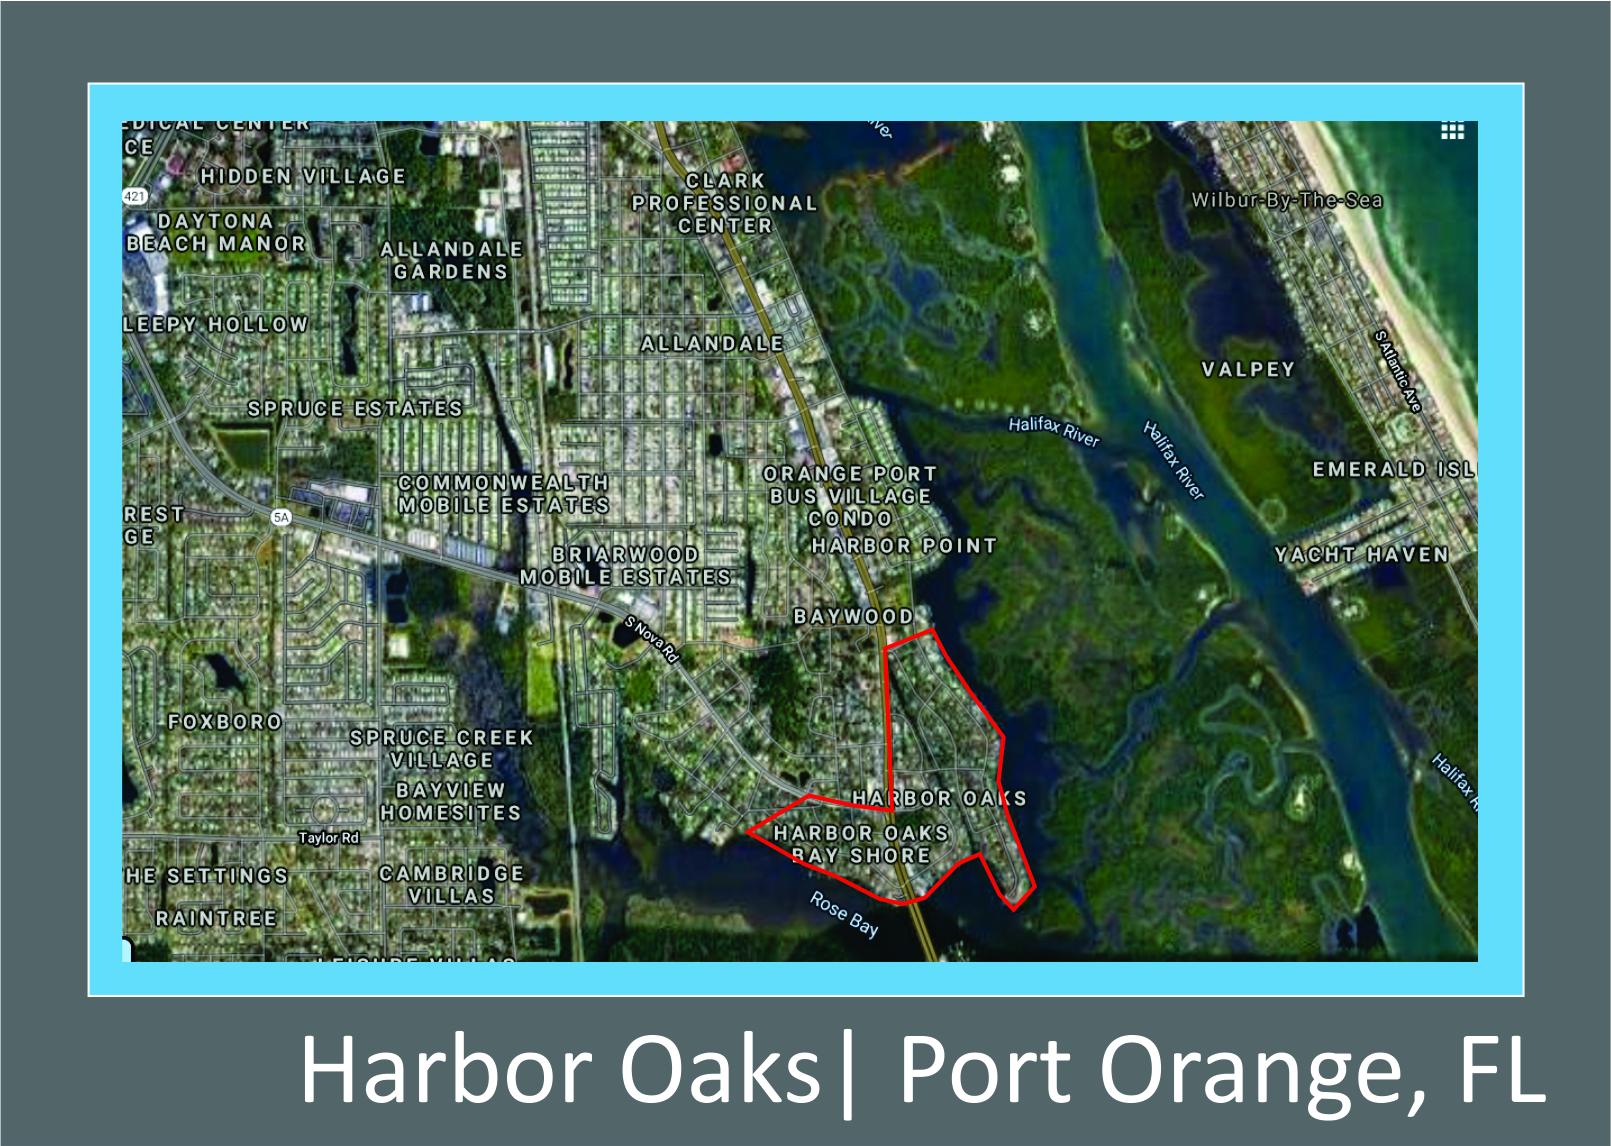 Map of Harbor Oaks, FL